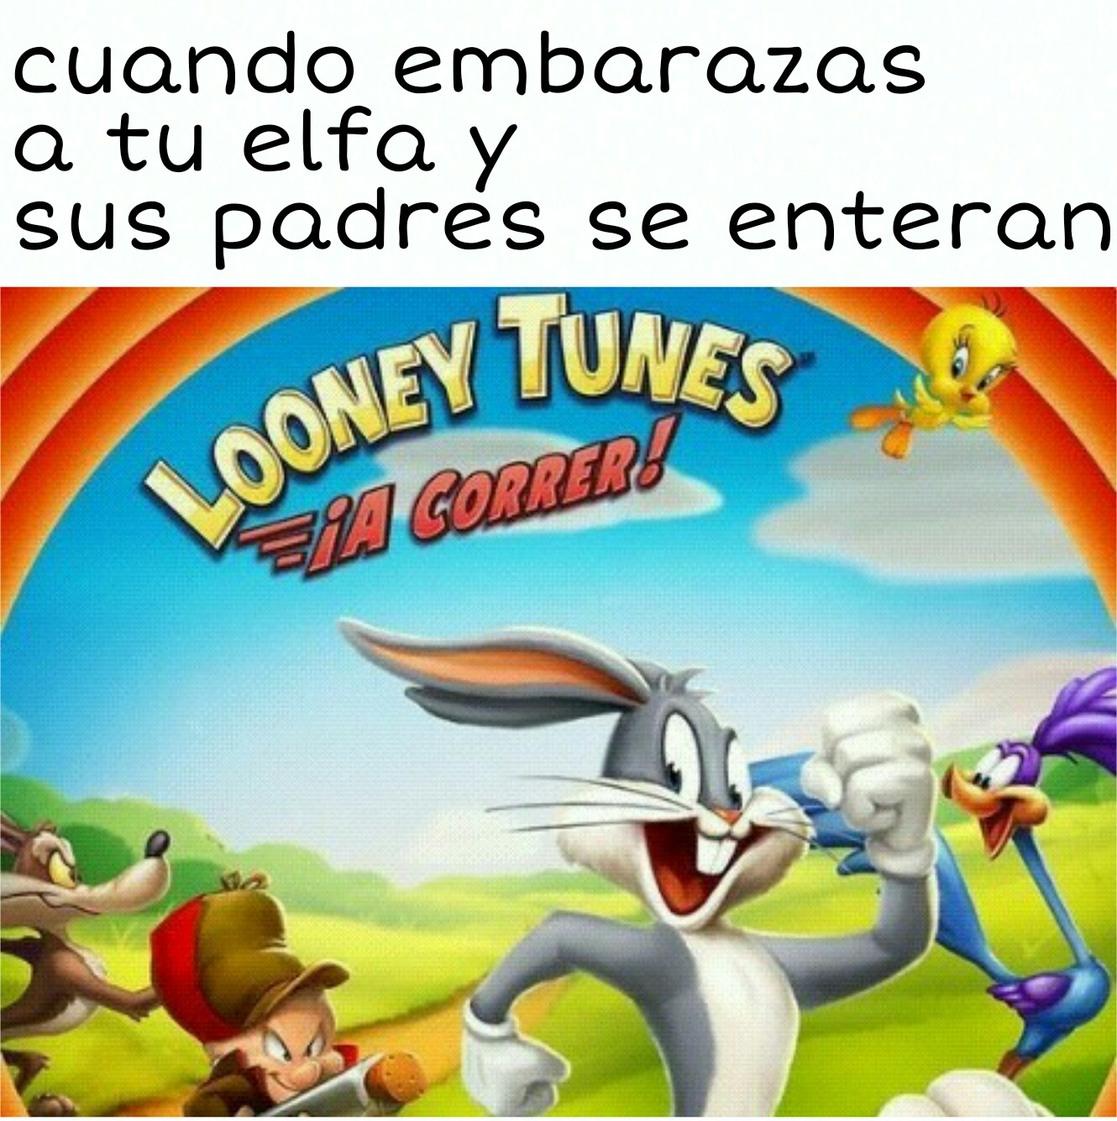 ¡A correr! - meme